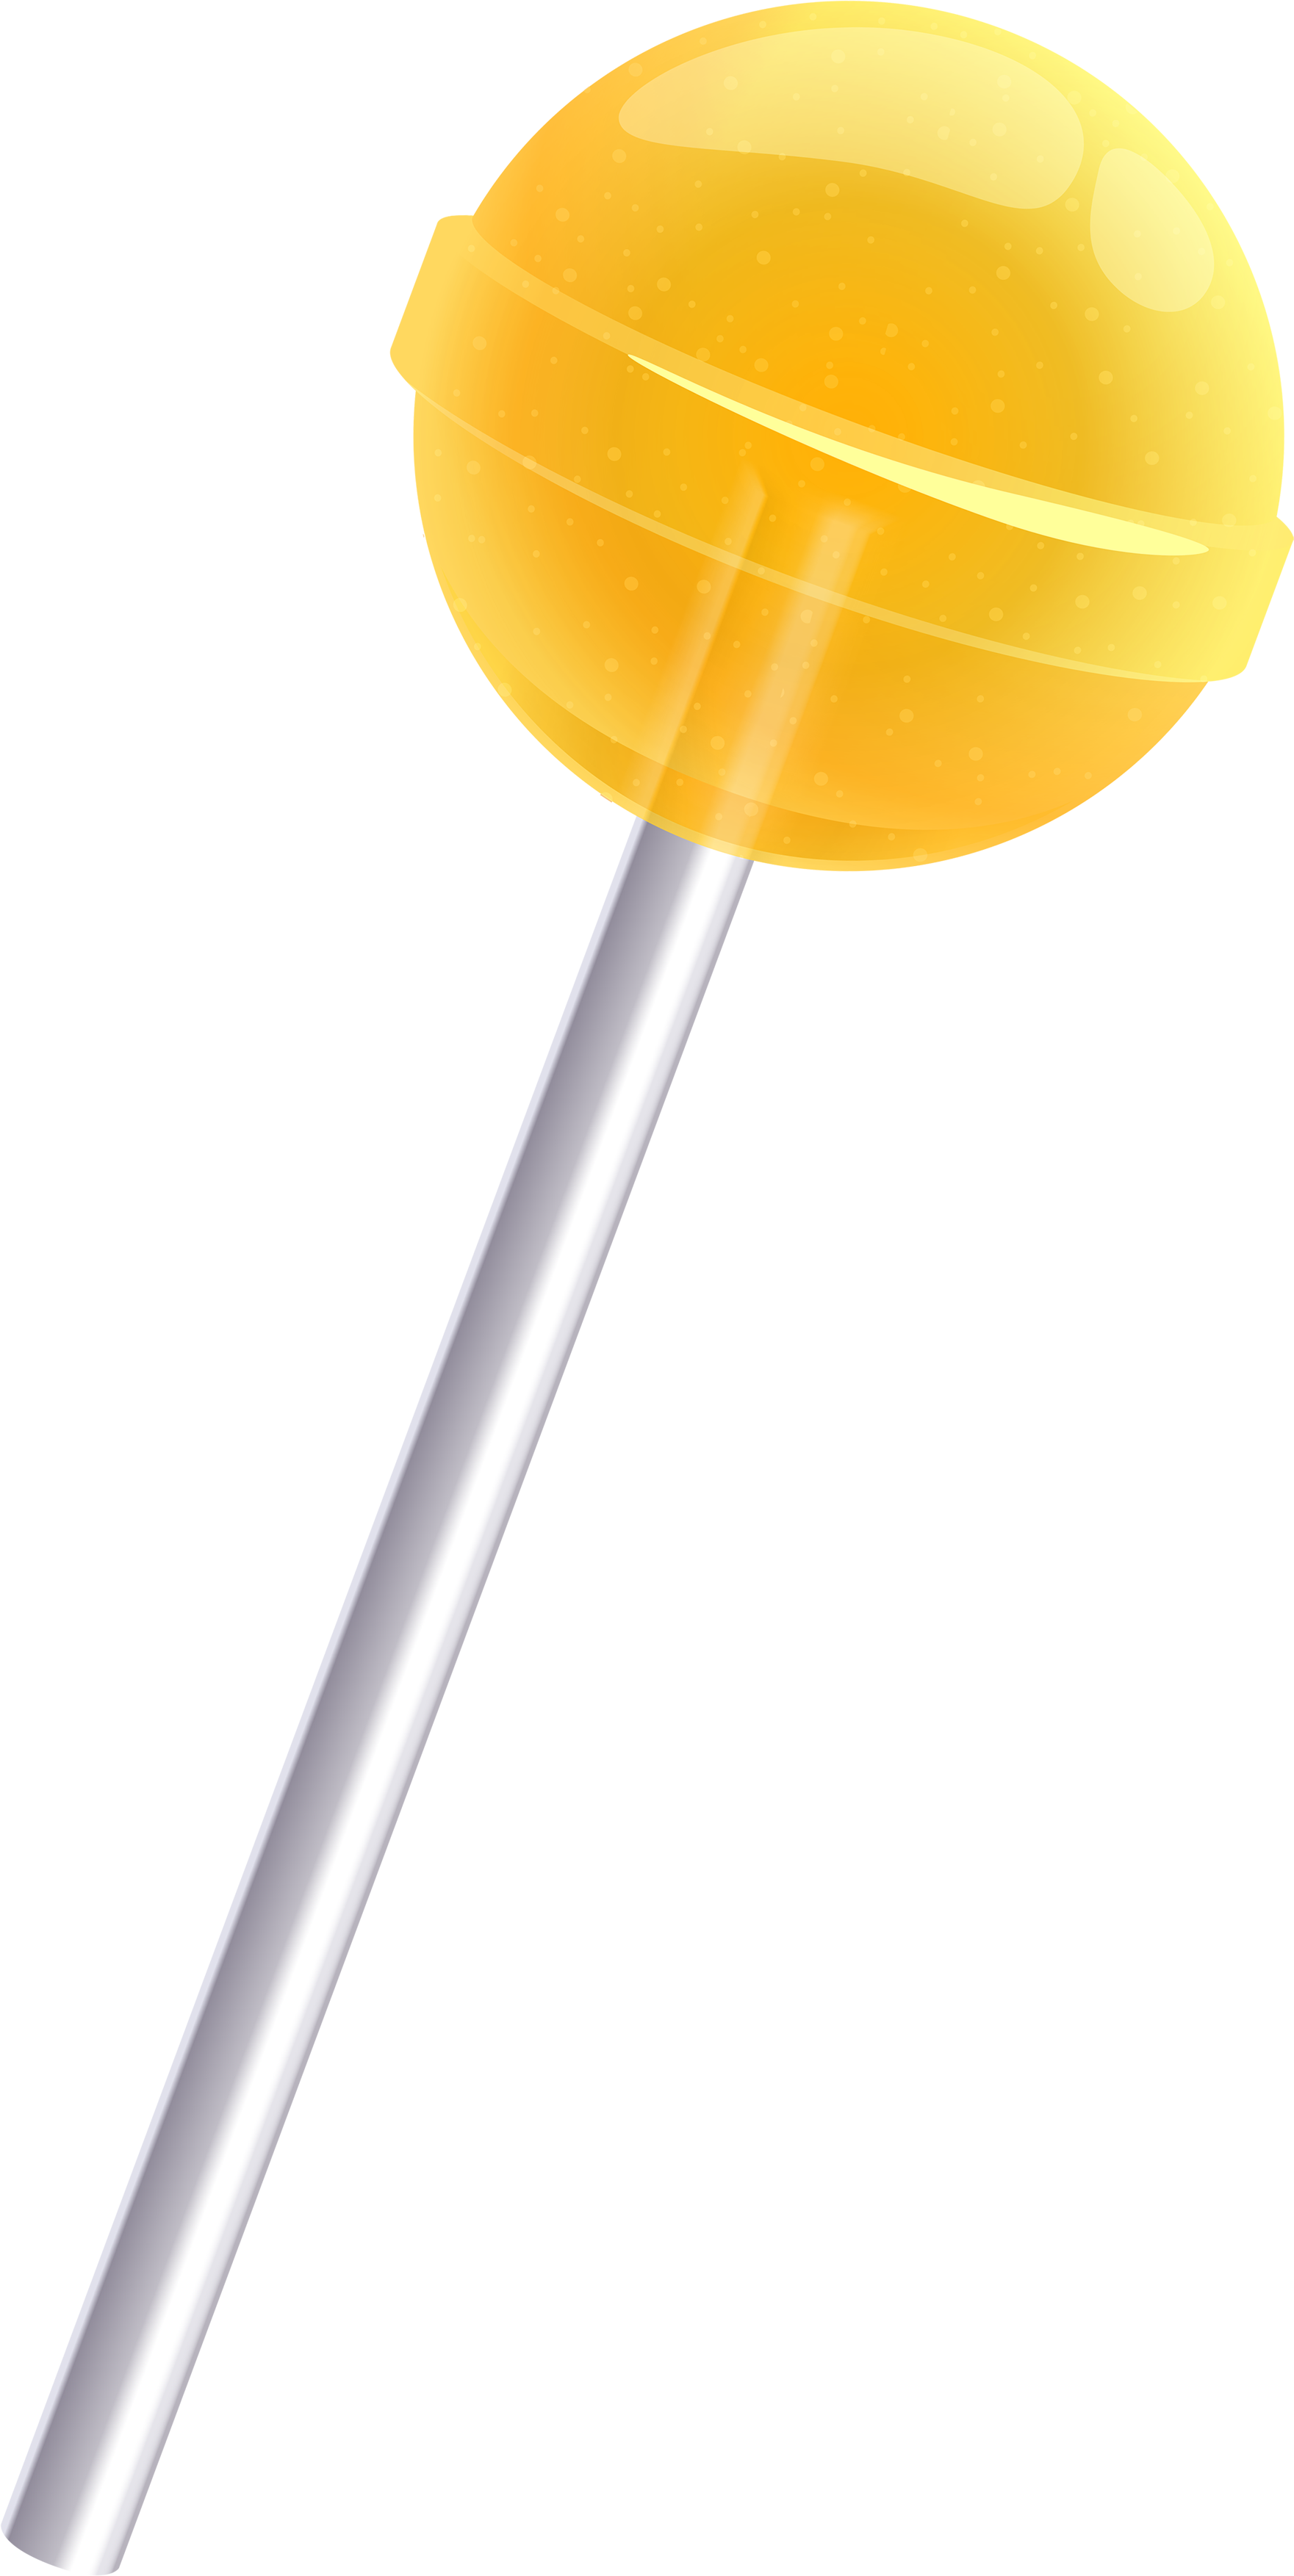 Lollipop PNG image free Download